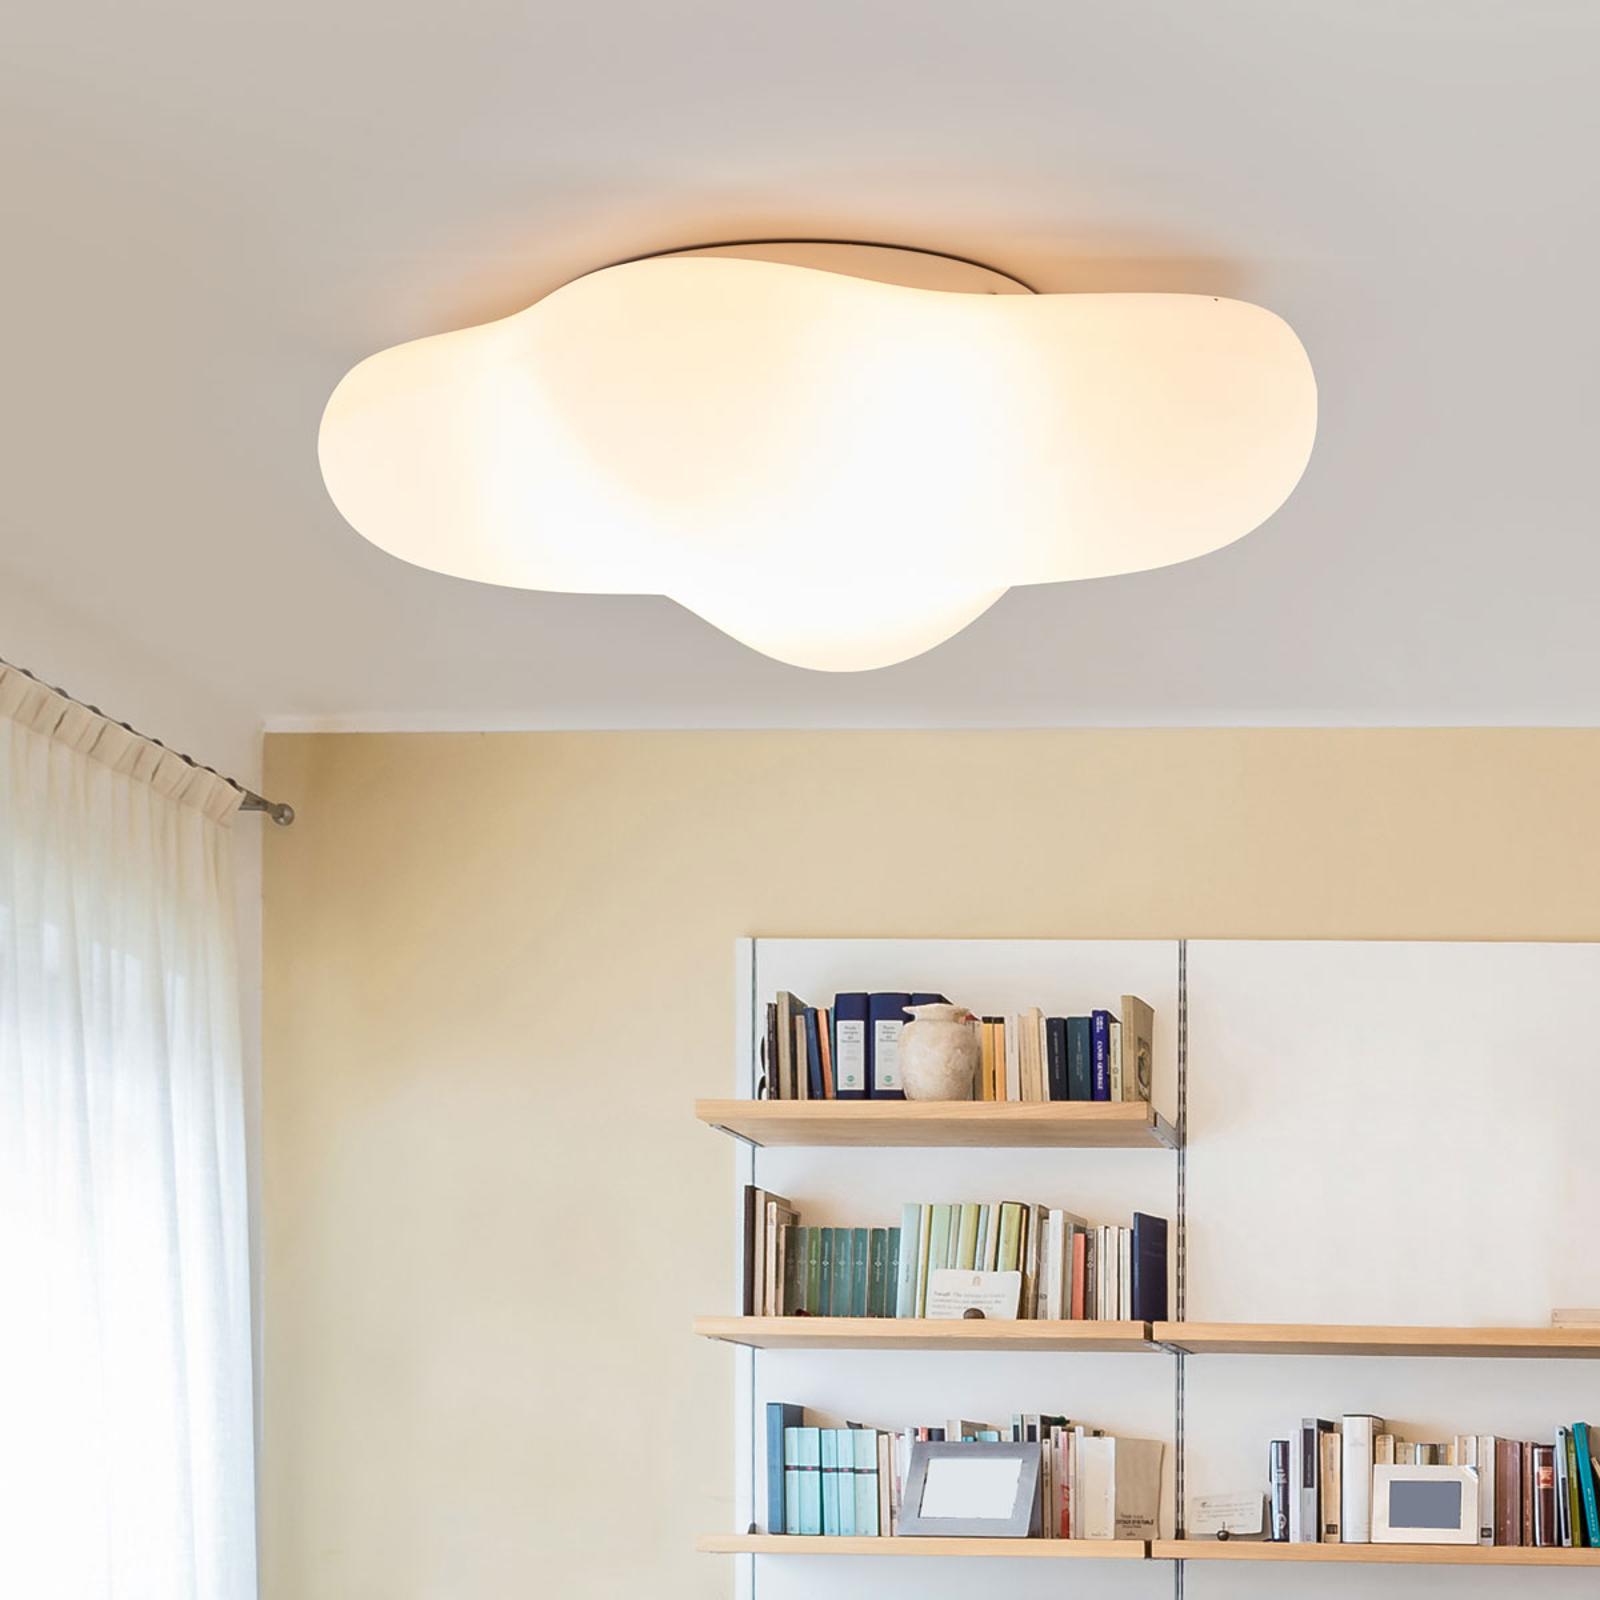 EOS - flot loftslampe